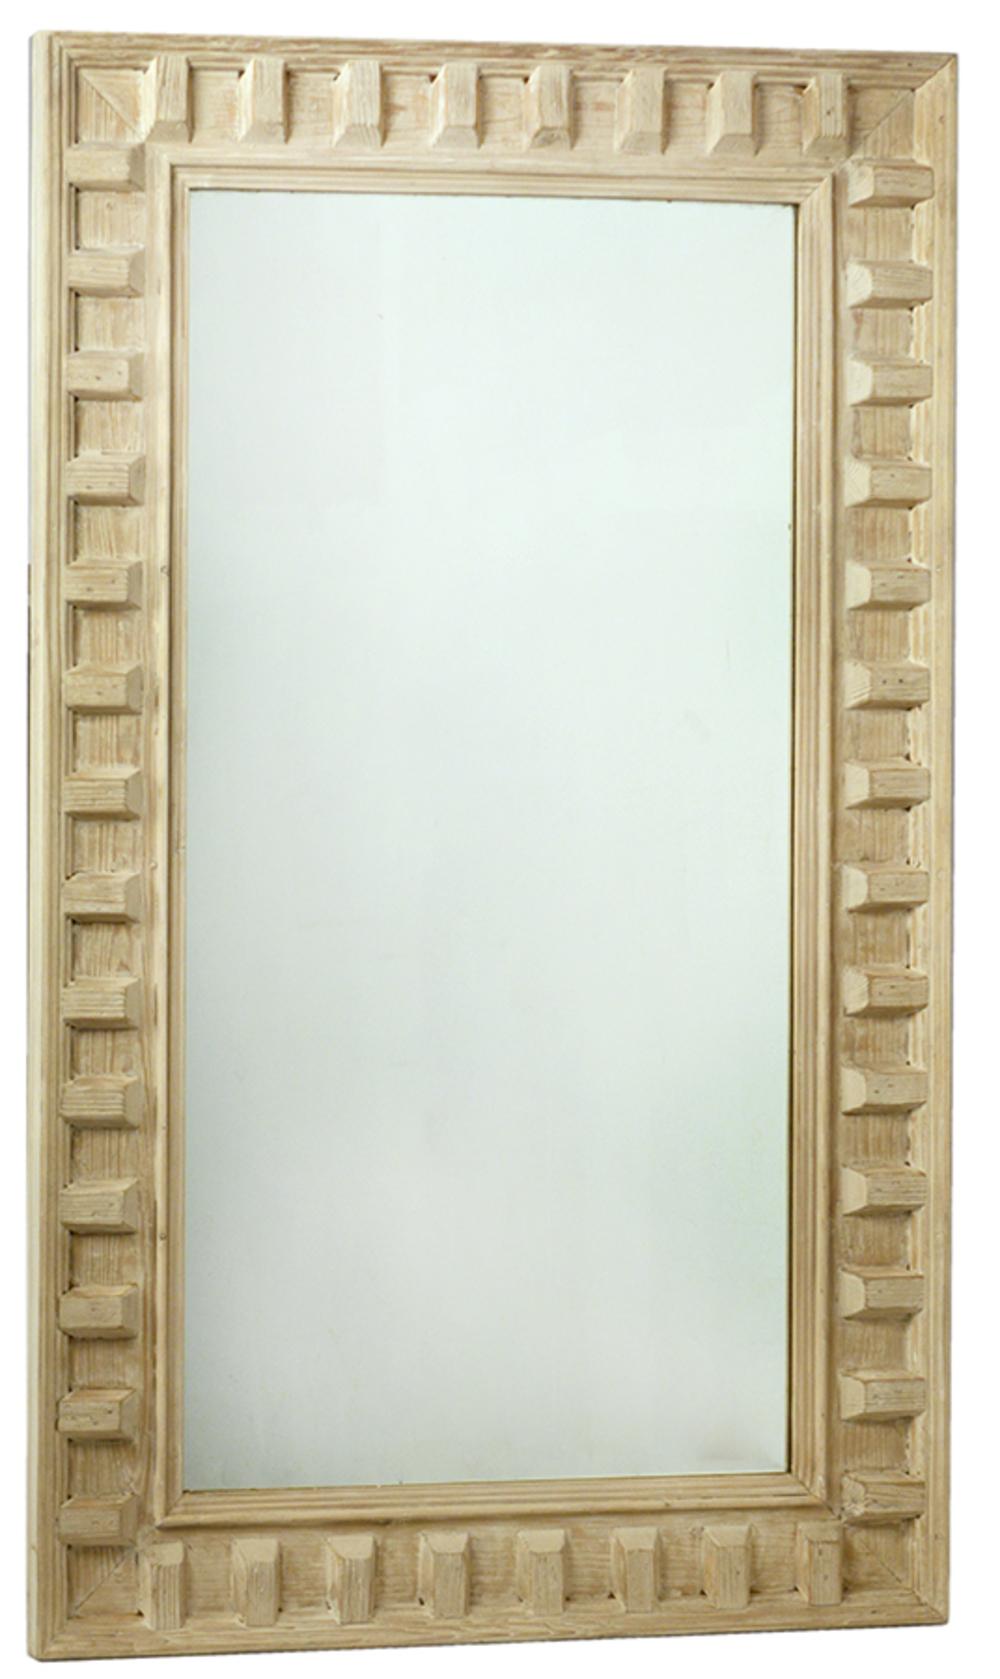 Dovetail Furniture - Benny Mirror